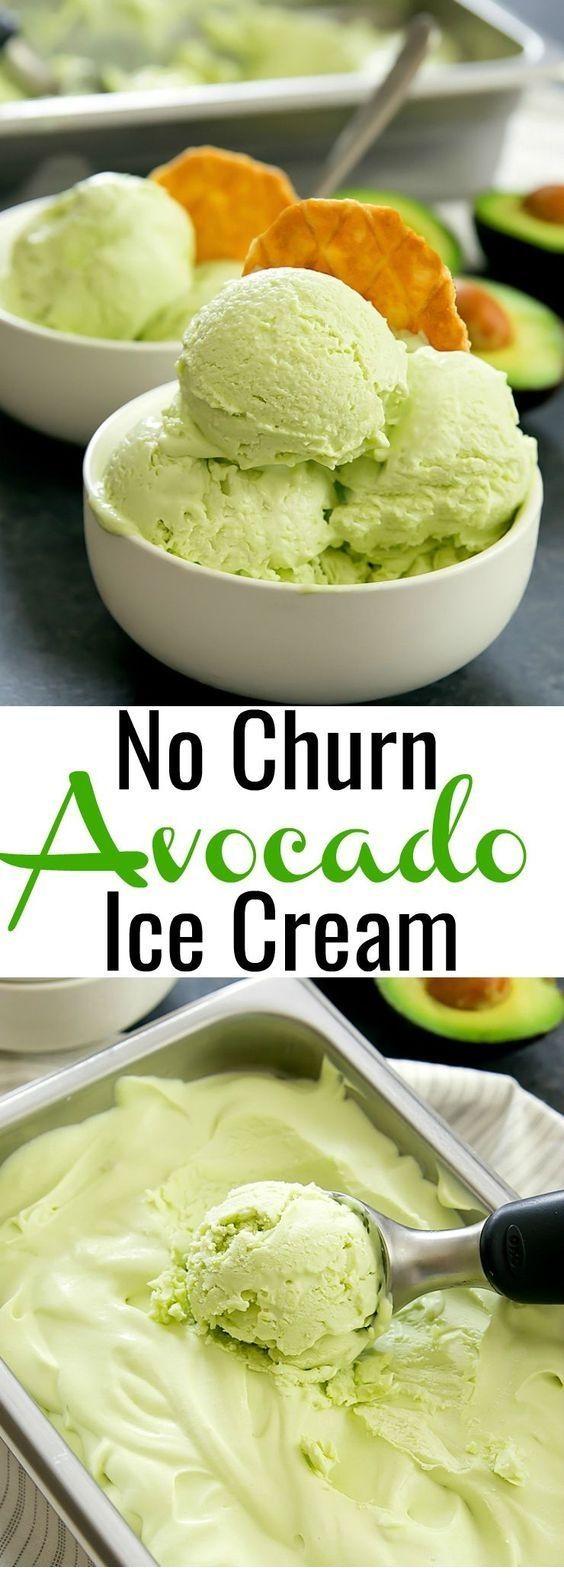 This Avocado is the perfect dinner recipe for busy weeknights!   Avocado Egg Salad, Avocado Recipes Keto, Avocado Recipes Dinner, Avocado Recipes Healthy, Avocado, Avocado Toast, Avocado Recipes, Avocado Salad #avocado #avocado recipes #avocado salad #avocado smoothie #avocado toast #avocat farci #avocat noyau #avocat recette #avocat salade #Churn #Cream #Ice